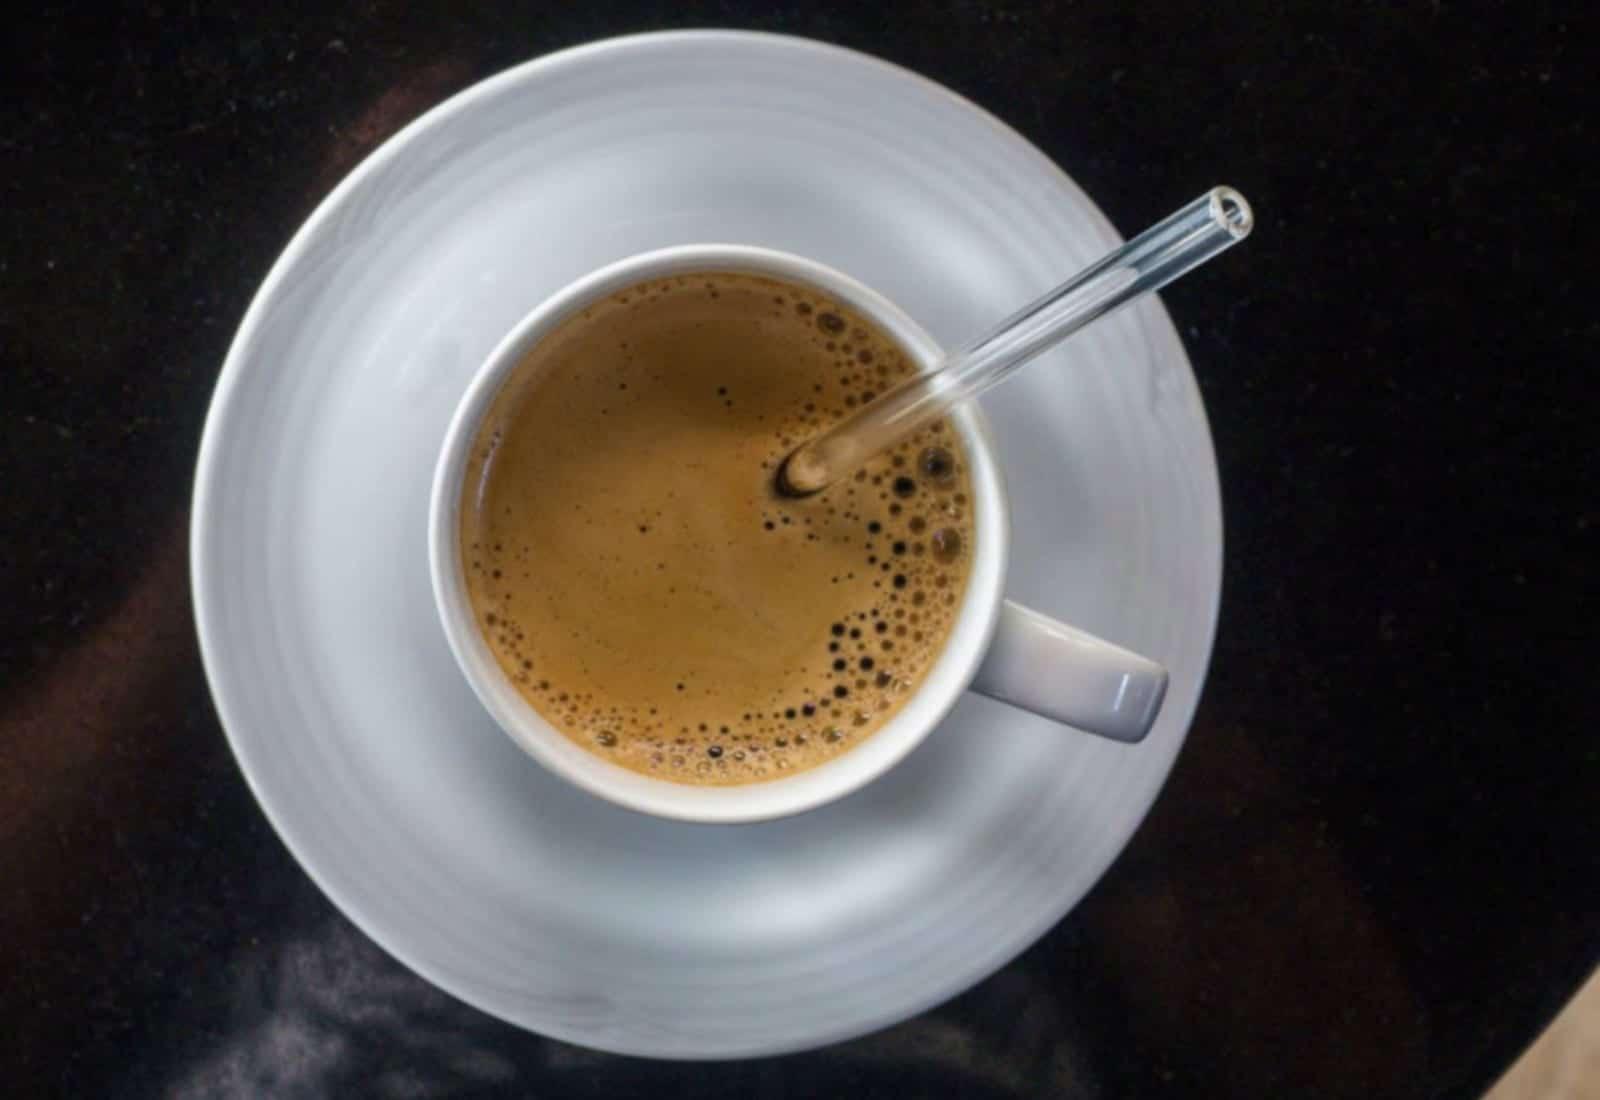 Hummingbird Glass Straws Hot Coffee Straw